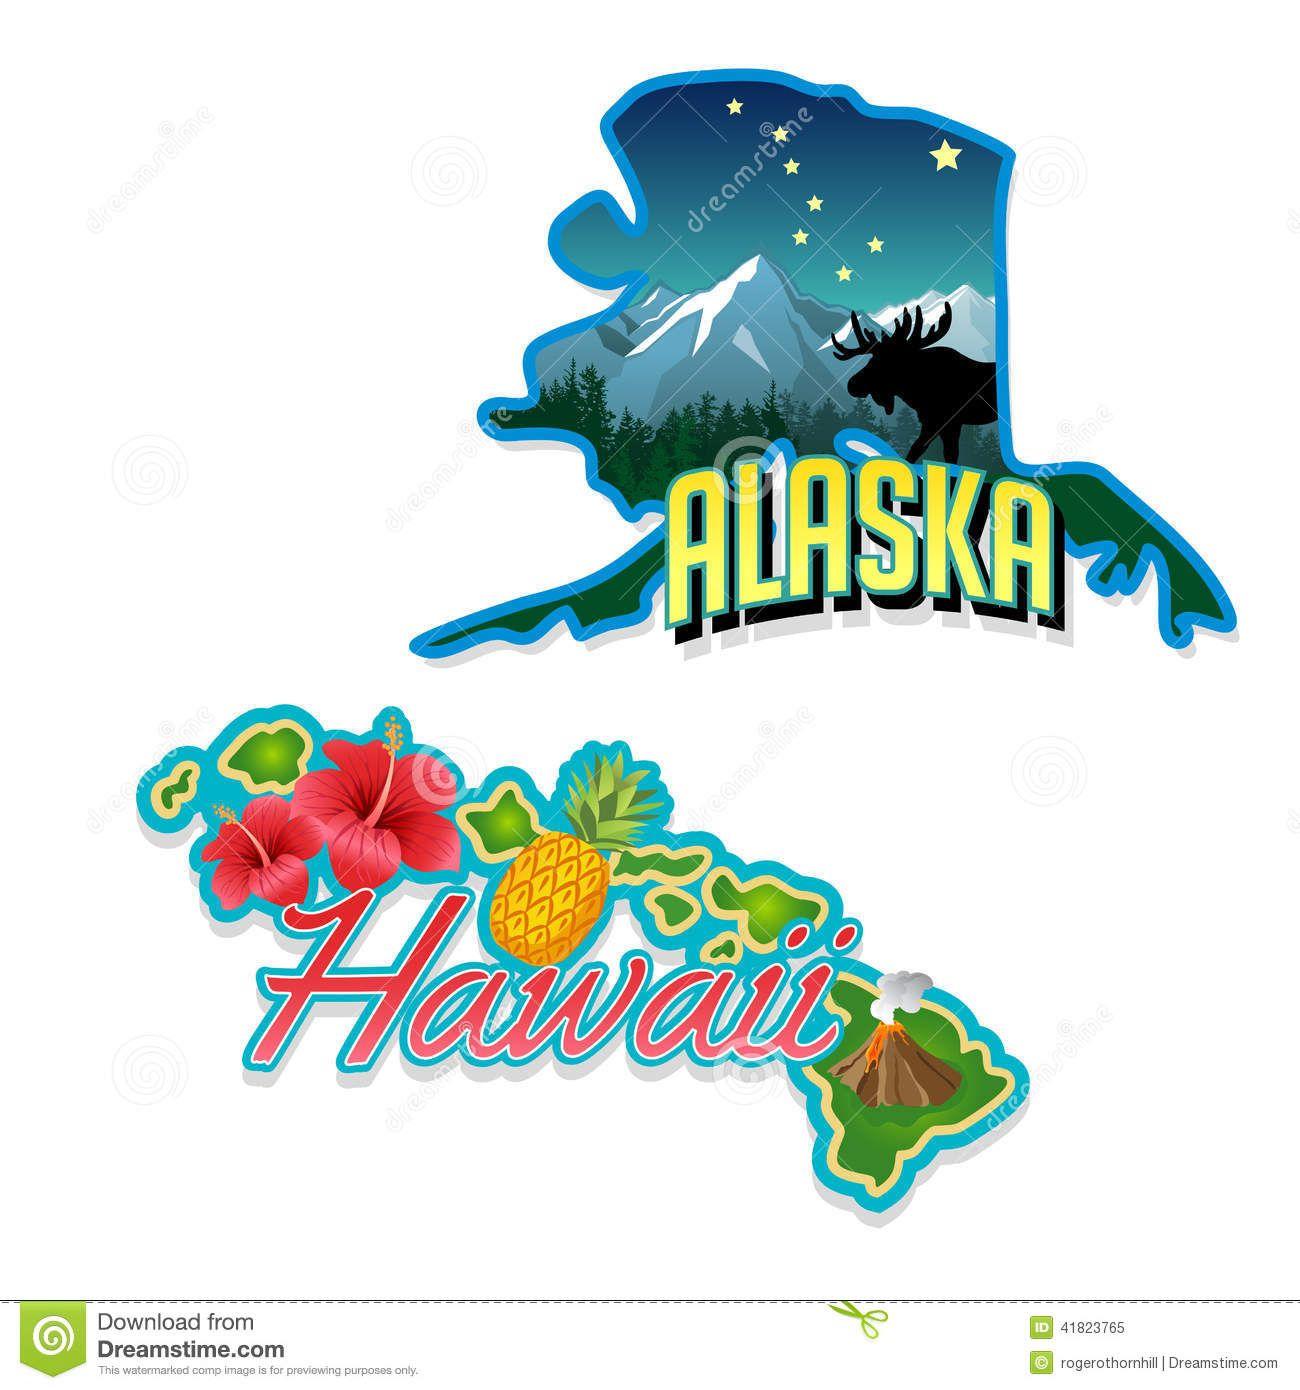 And hawaii become the. Alaska clipart cute